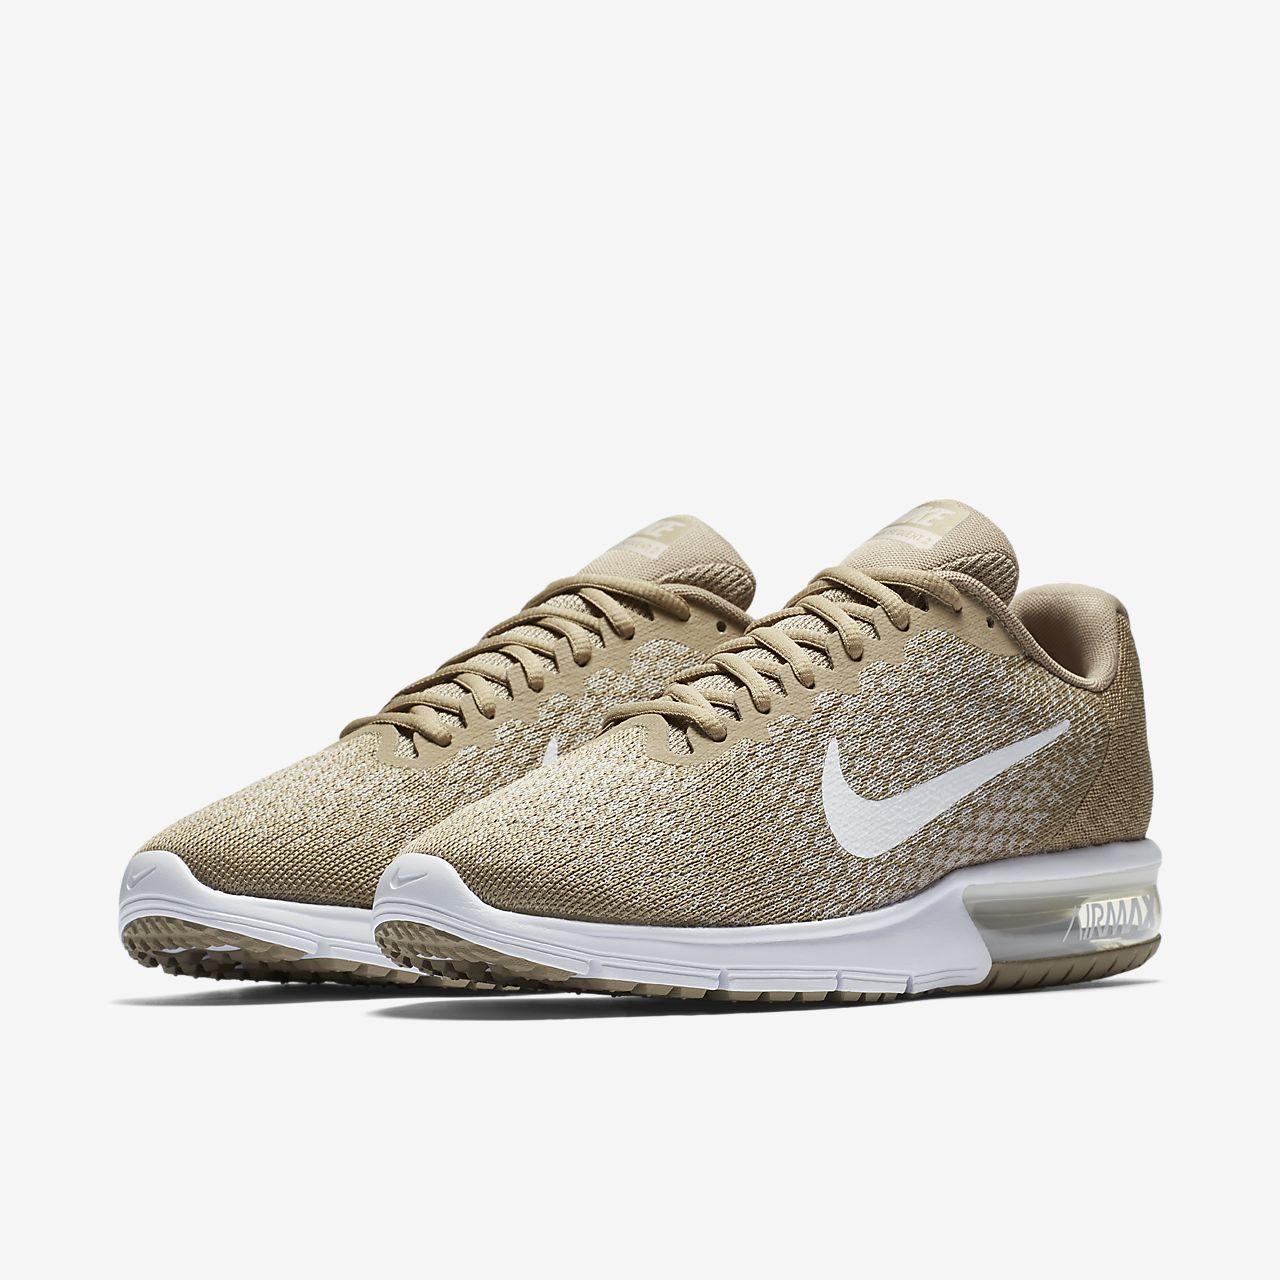 nike running shoes khaki